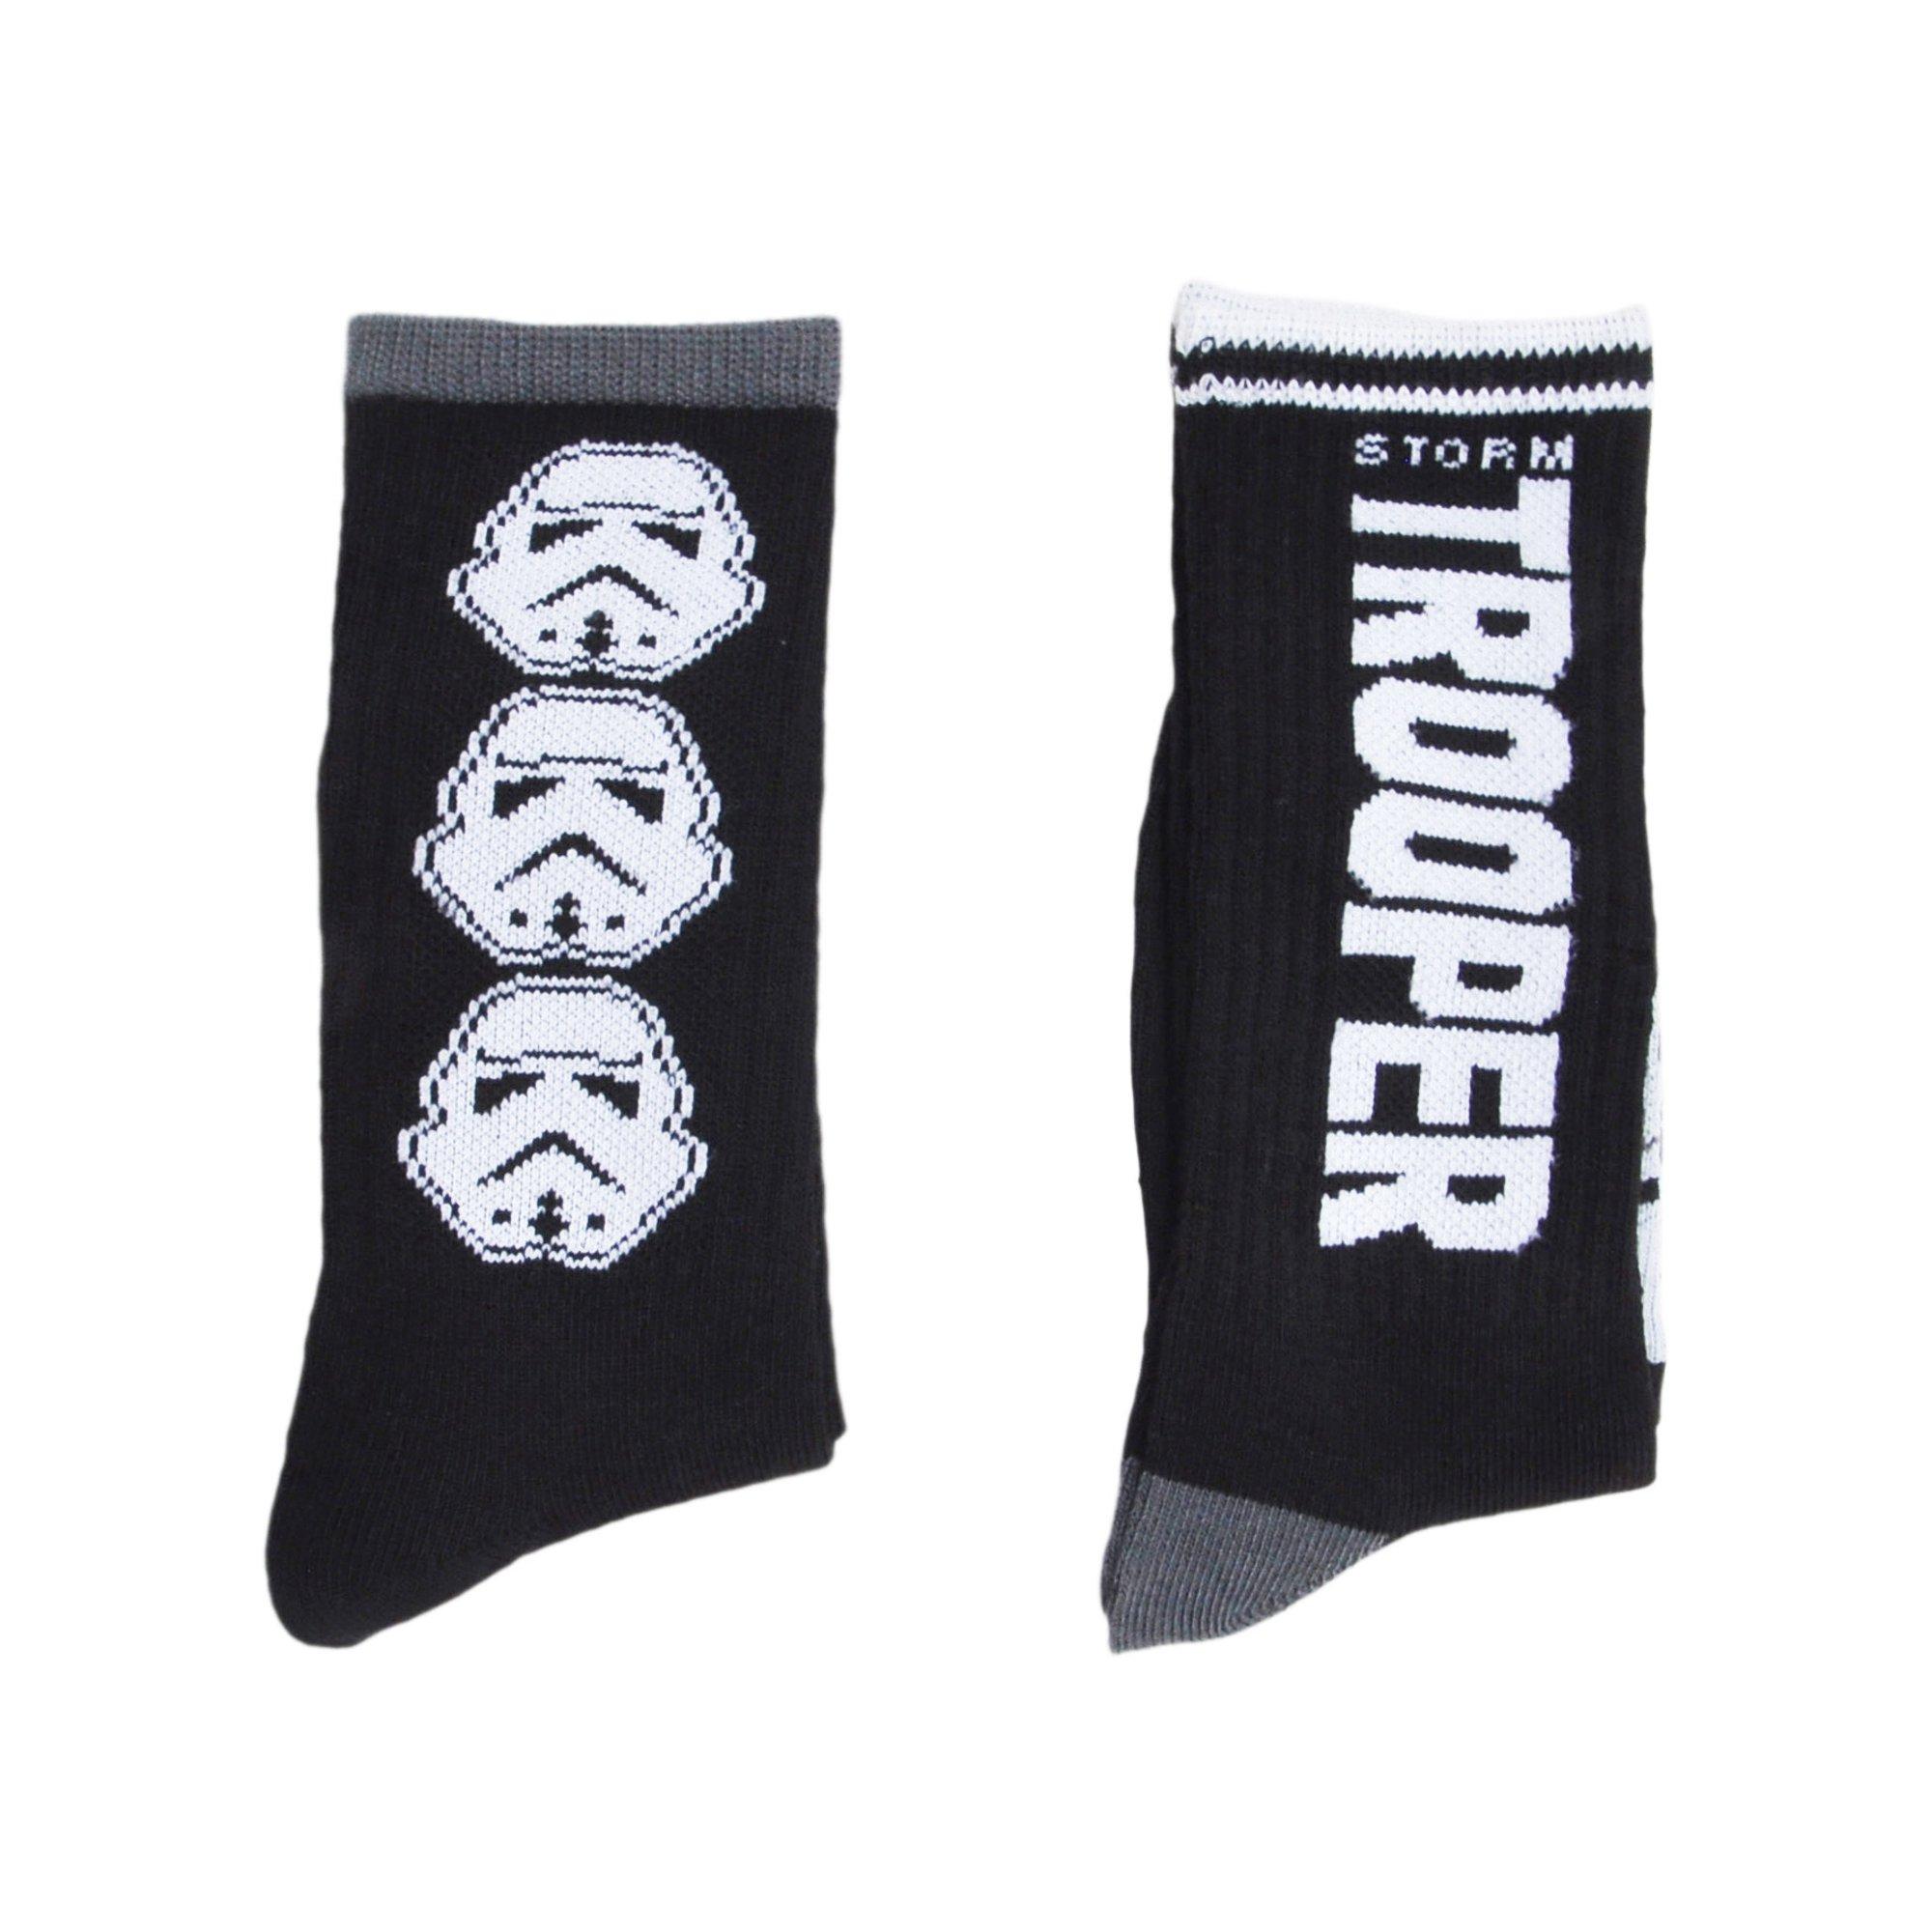 24787932b01 Boys Stormtrooper Crew Socks Black 2-PAIRS Trooper Print